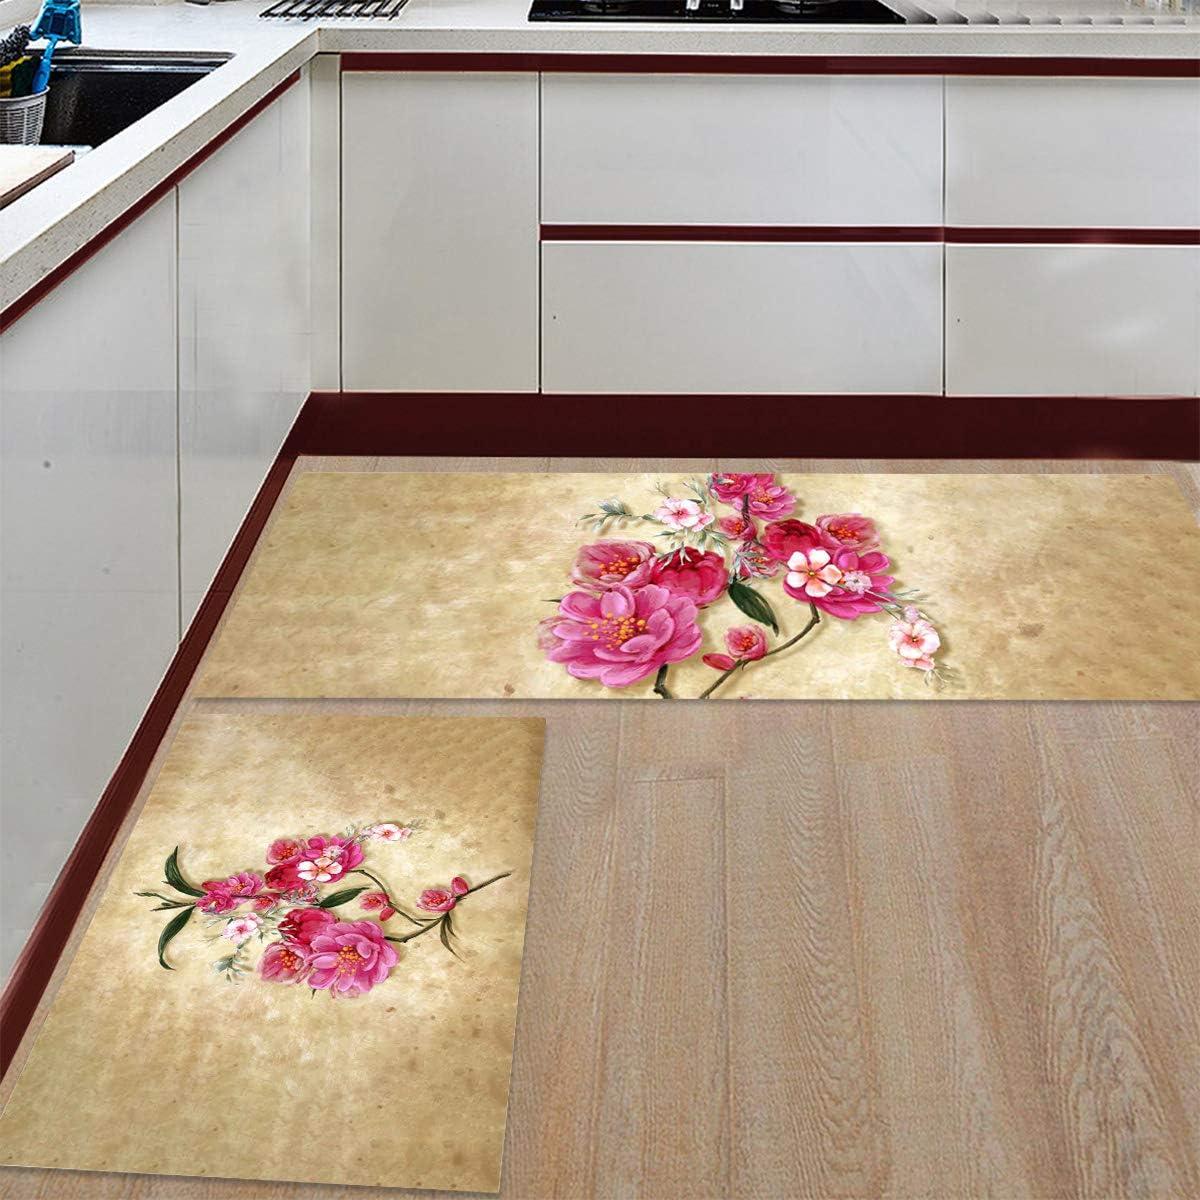 Advancey 2 Dedication Pieces Anti-Slip Kitchen Mats Drawn Flow Vintage Hand Free shipping